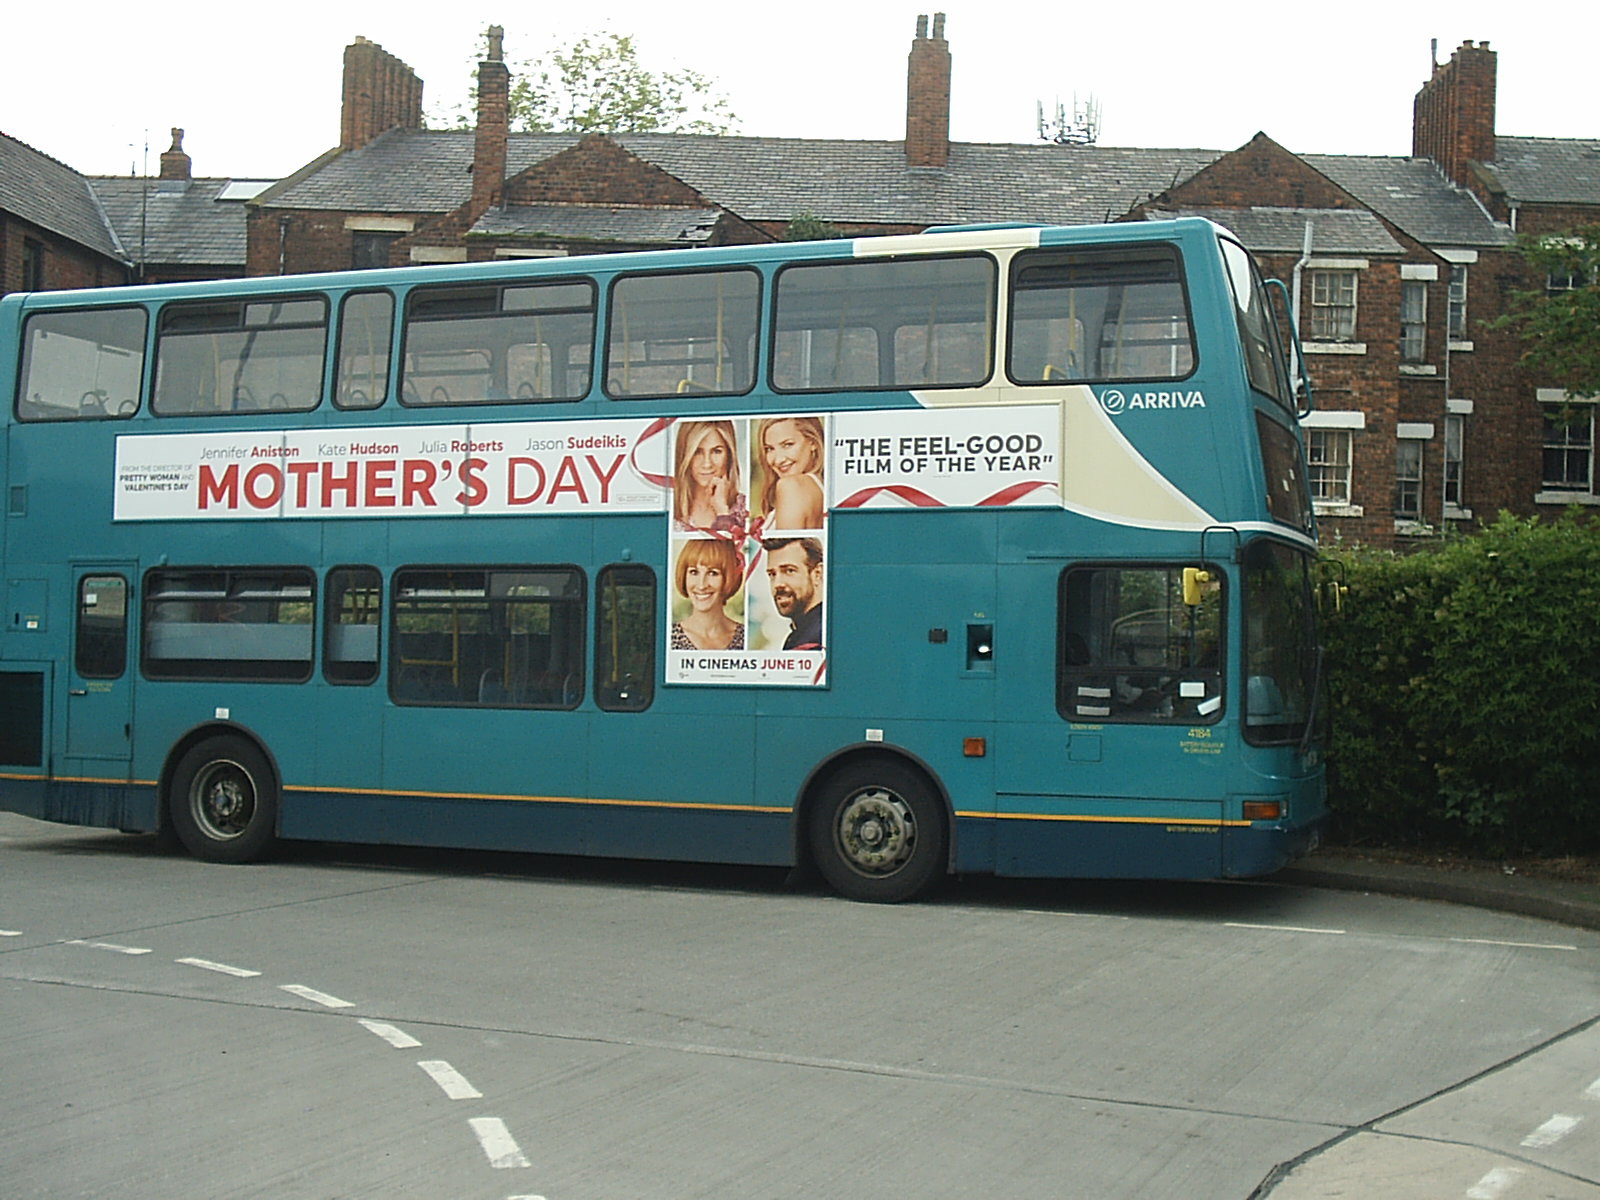 Mattybuzz: Trip to Wigan / Salford 28-05-2016